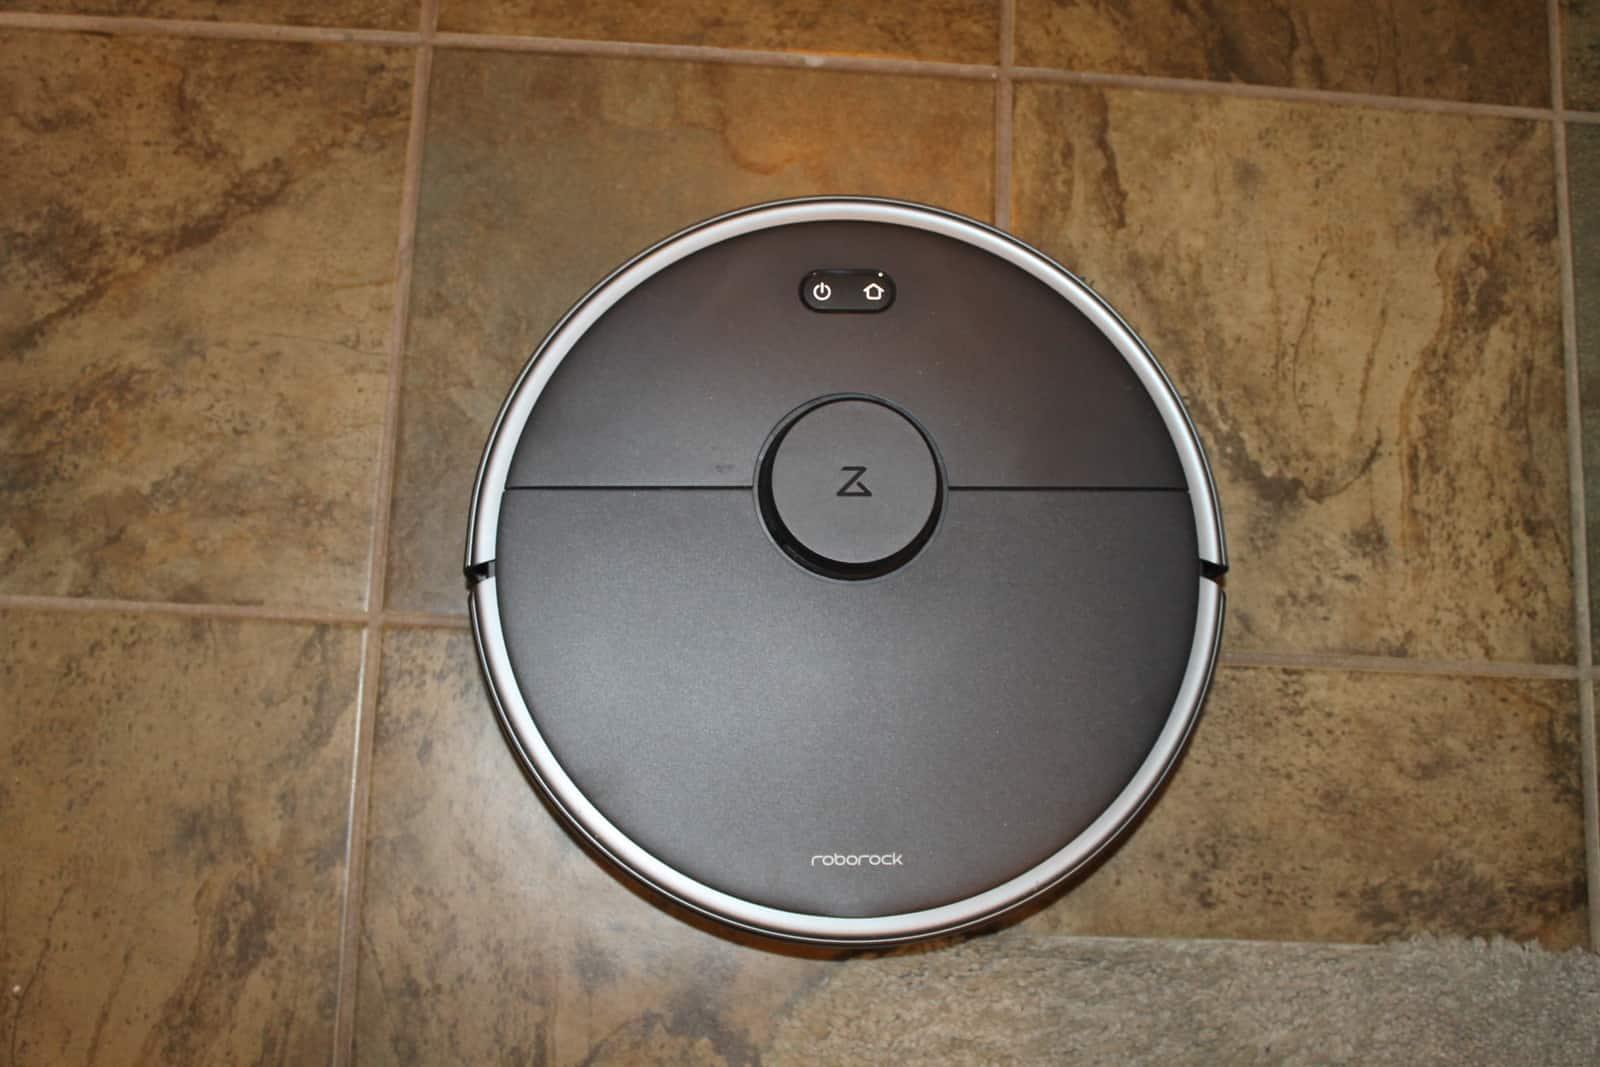 The Roborock S4 max on a tile floor.